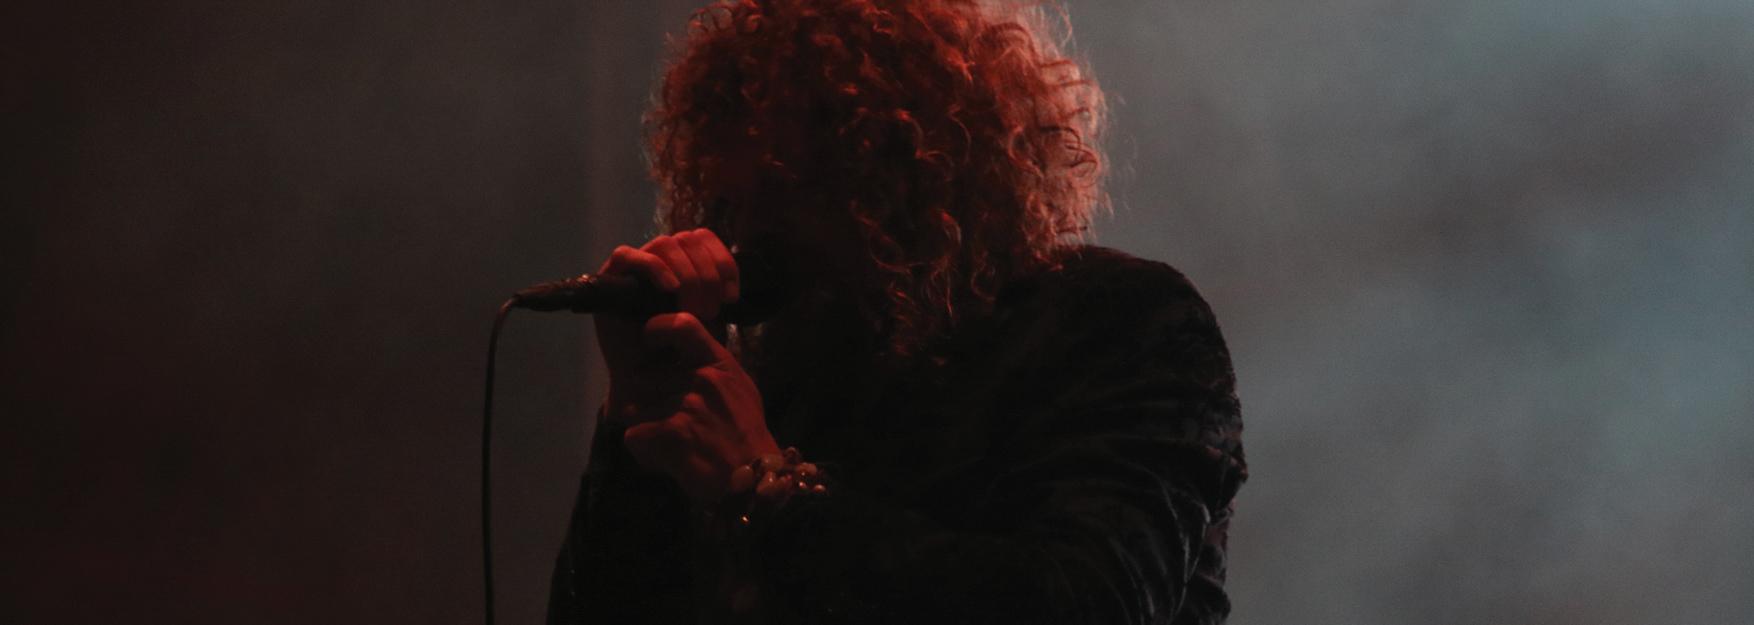 Bevrijdingsfestival-Direct-zanger-op-podium